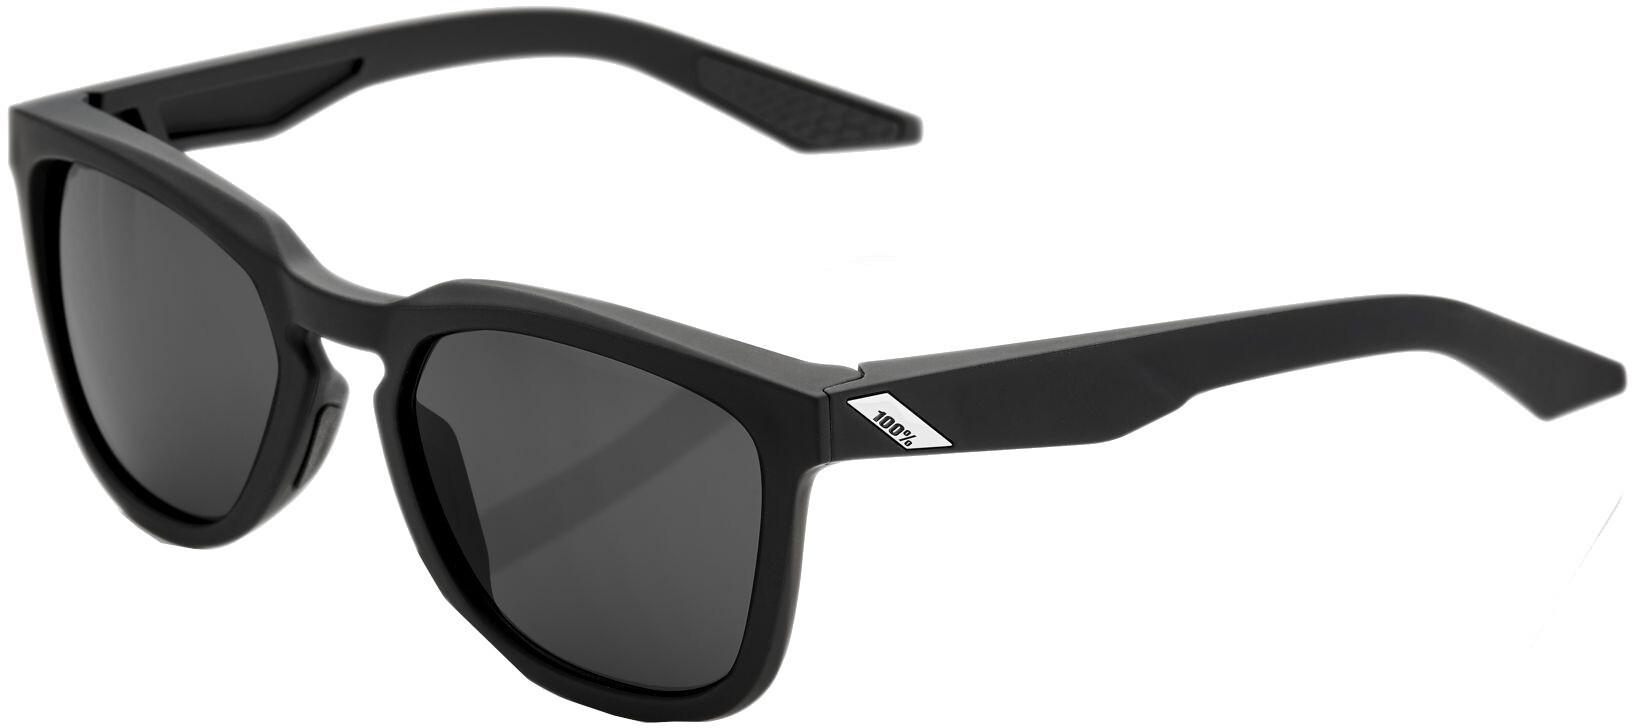 100% Hudson Smoke Cykelbriller, soft tact black | Briller